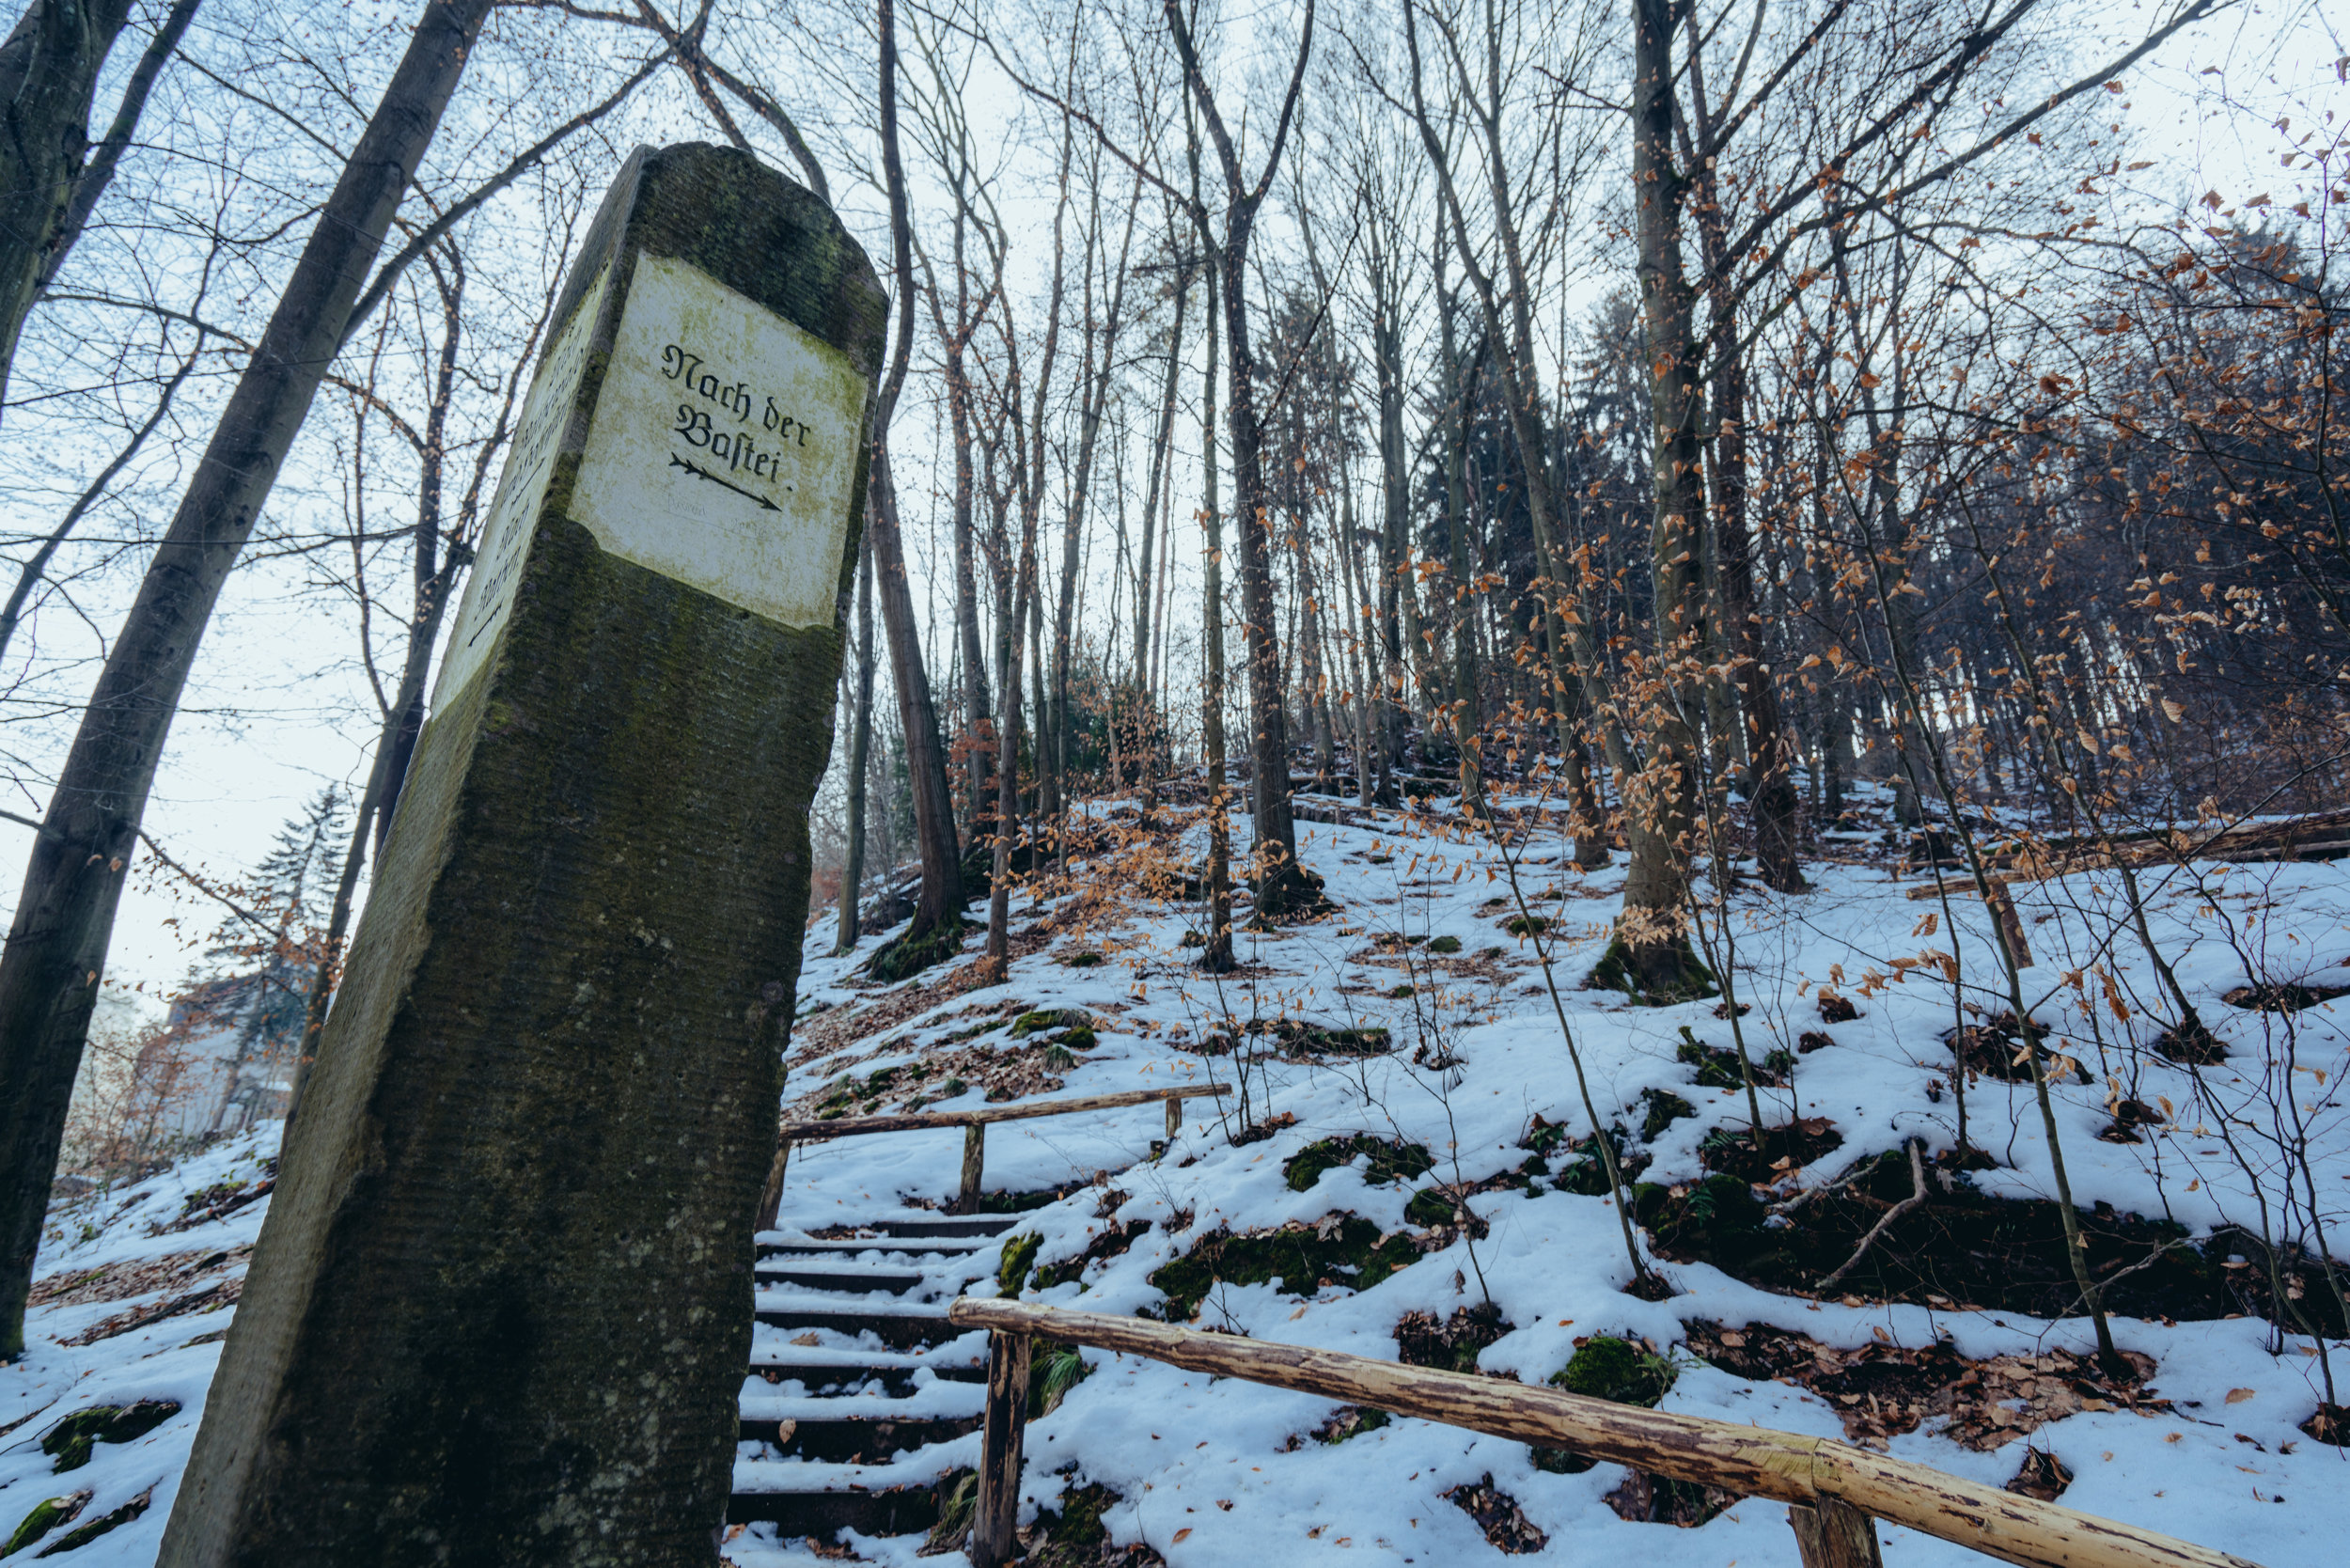 A signpost pointing to Bastei, Saxon Switzerland National Park